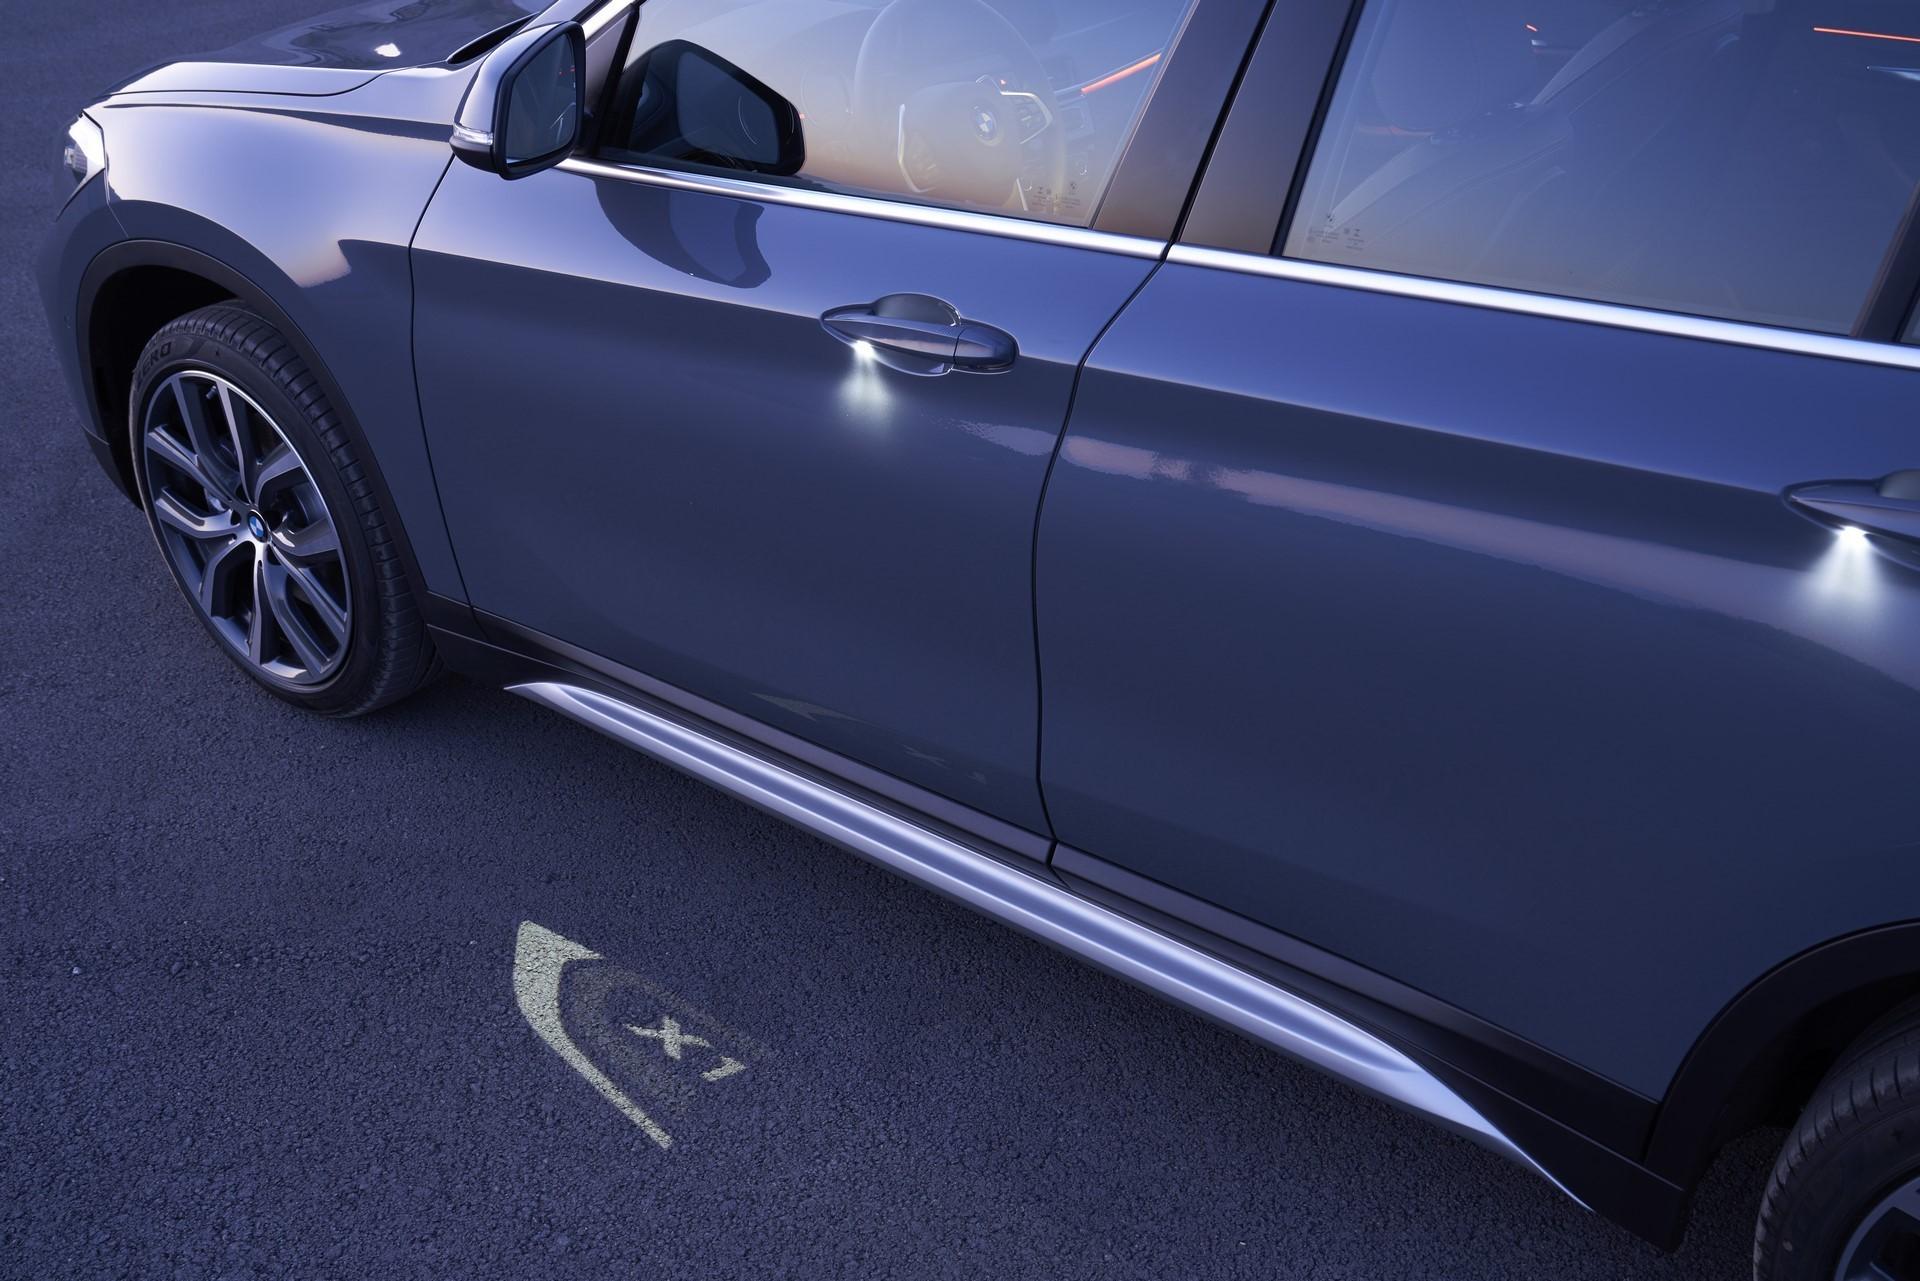 BMW-X1-Facelift-2019-23